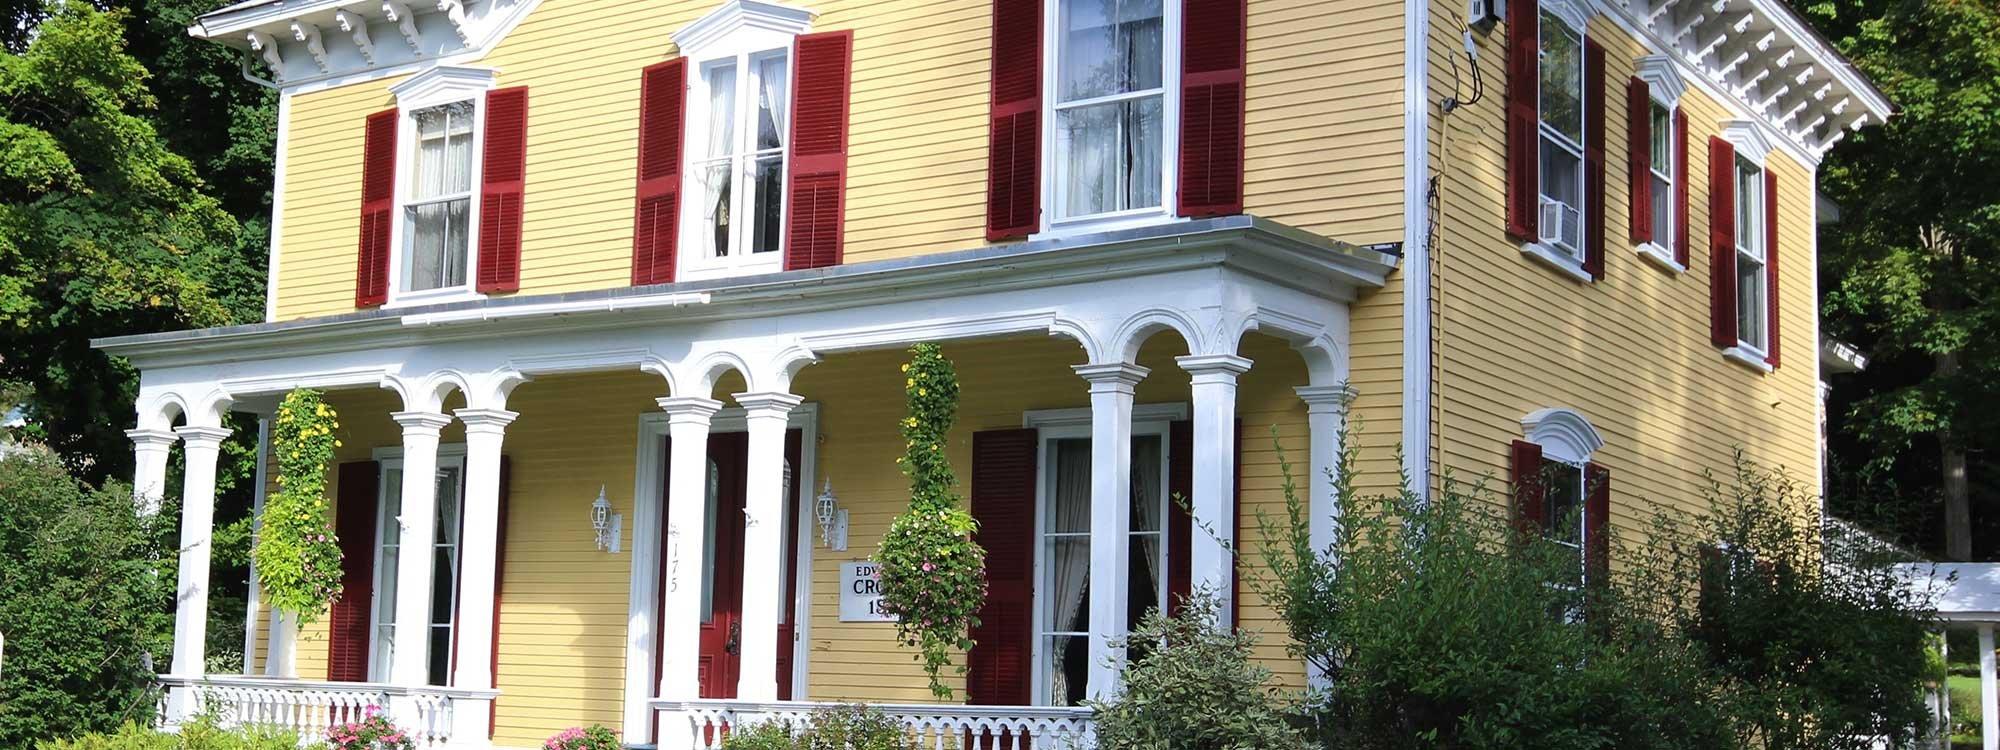 1868 Crosby House in Brattleboro, Vermont